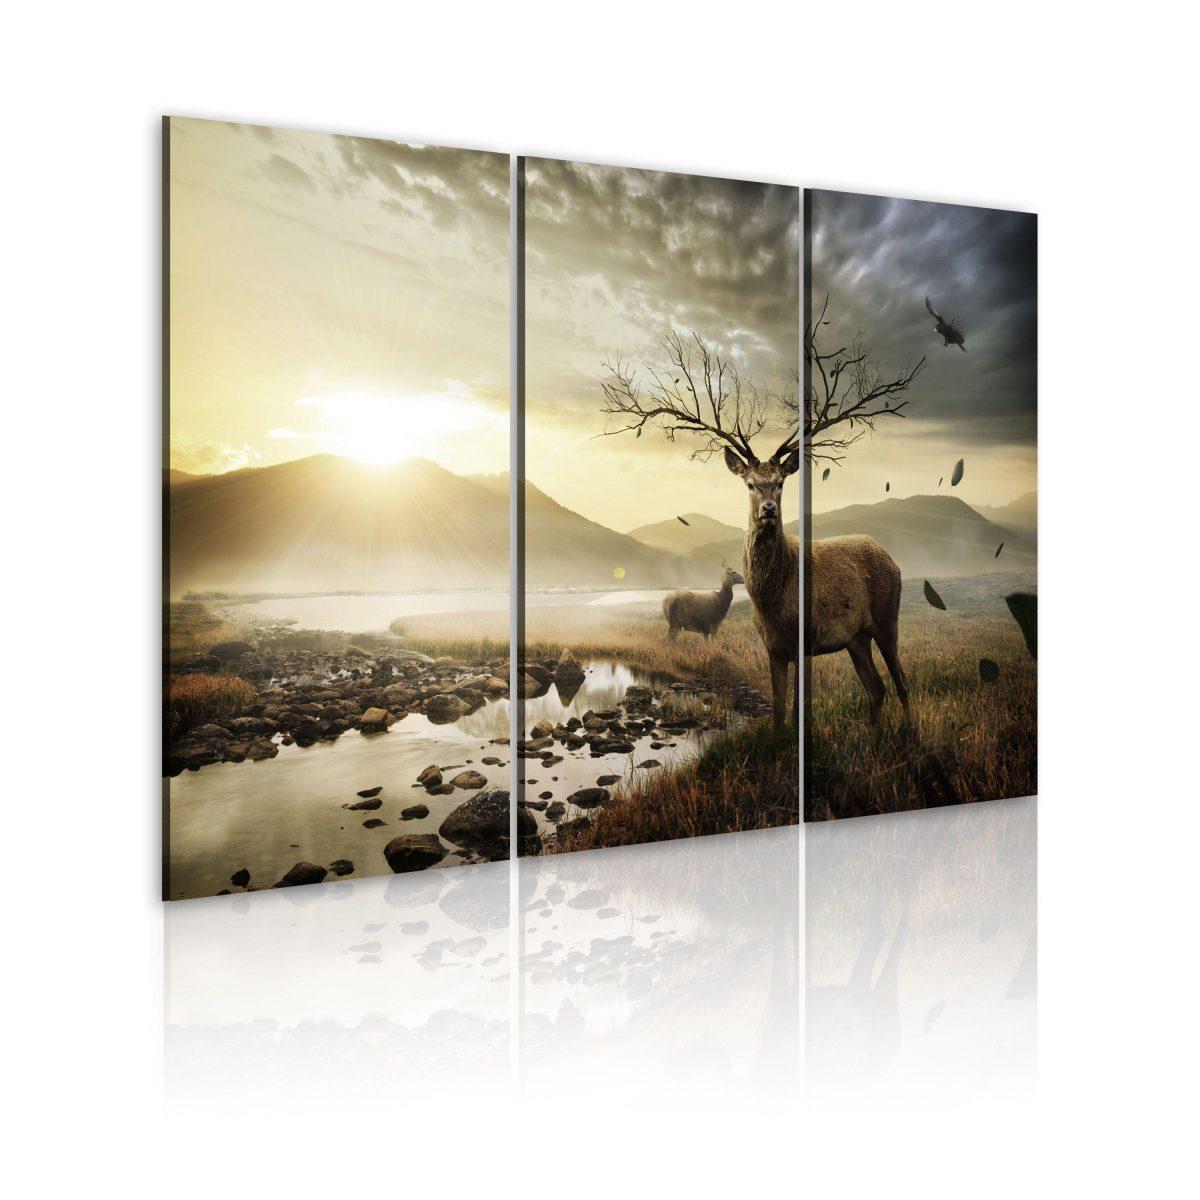 Canvas Tavla - Deer with a tree-like antlers - 120x80